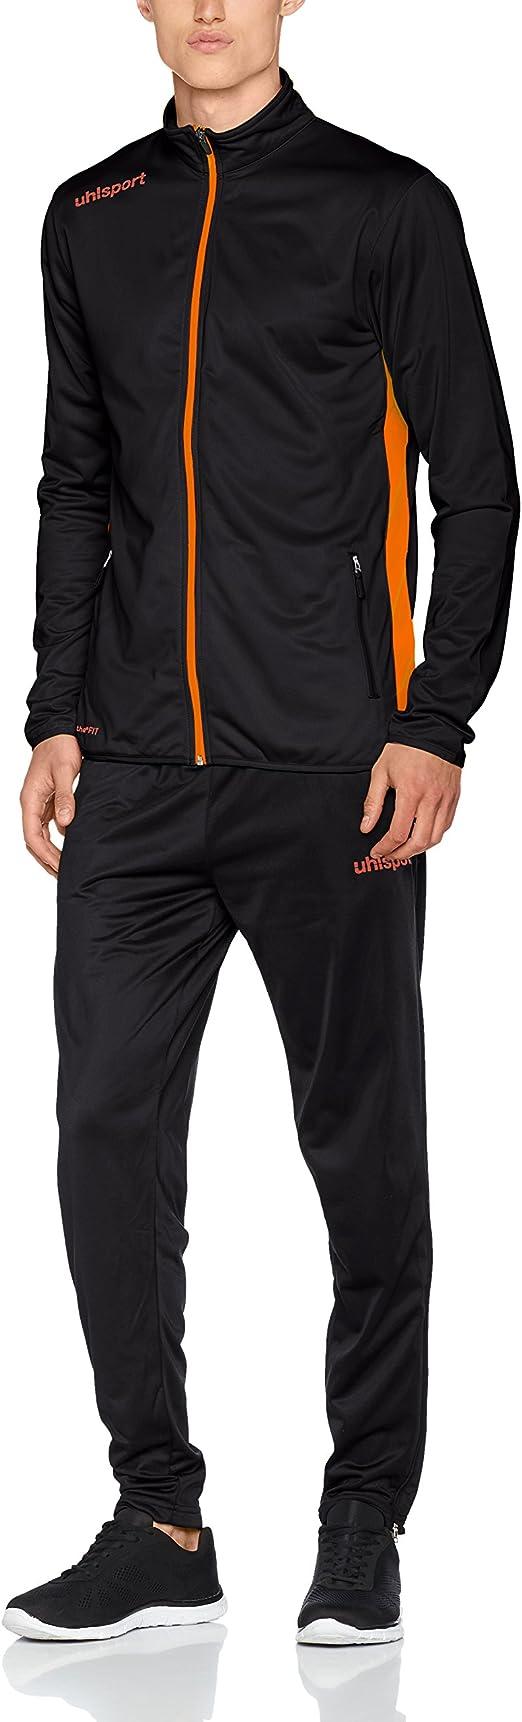 uhlsport Essential Classic Chándal, Hombre: Amazon.es: Deportes y ...